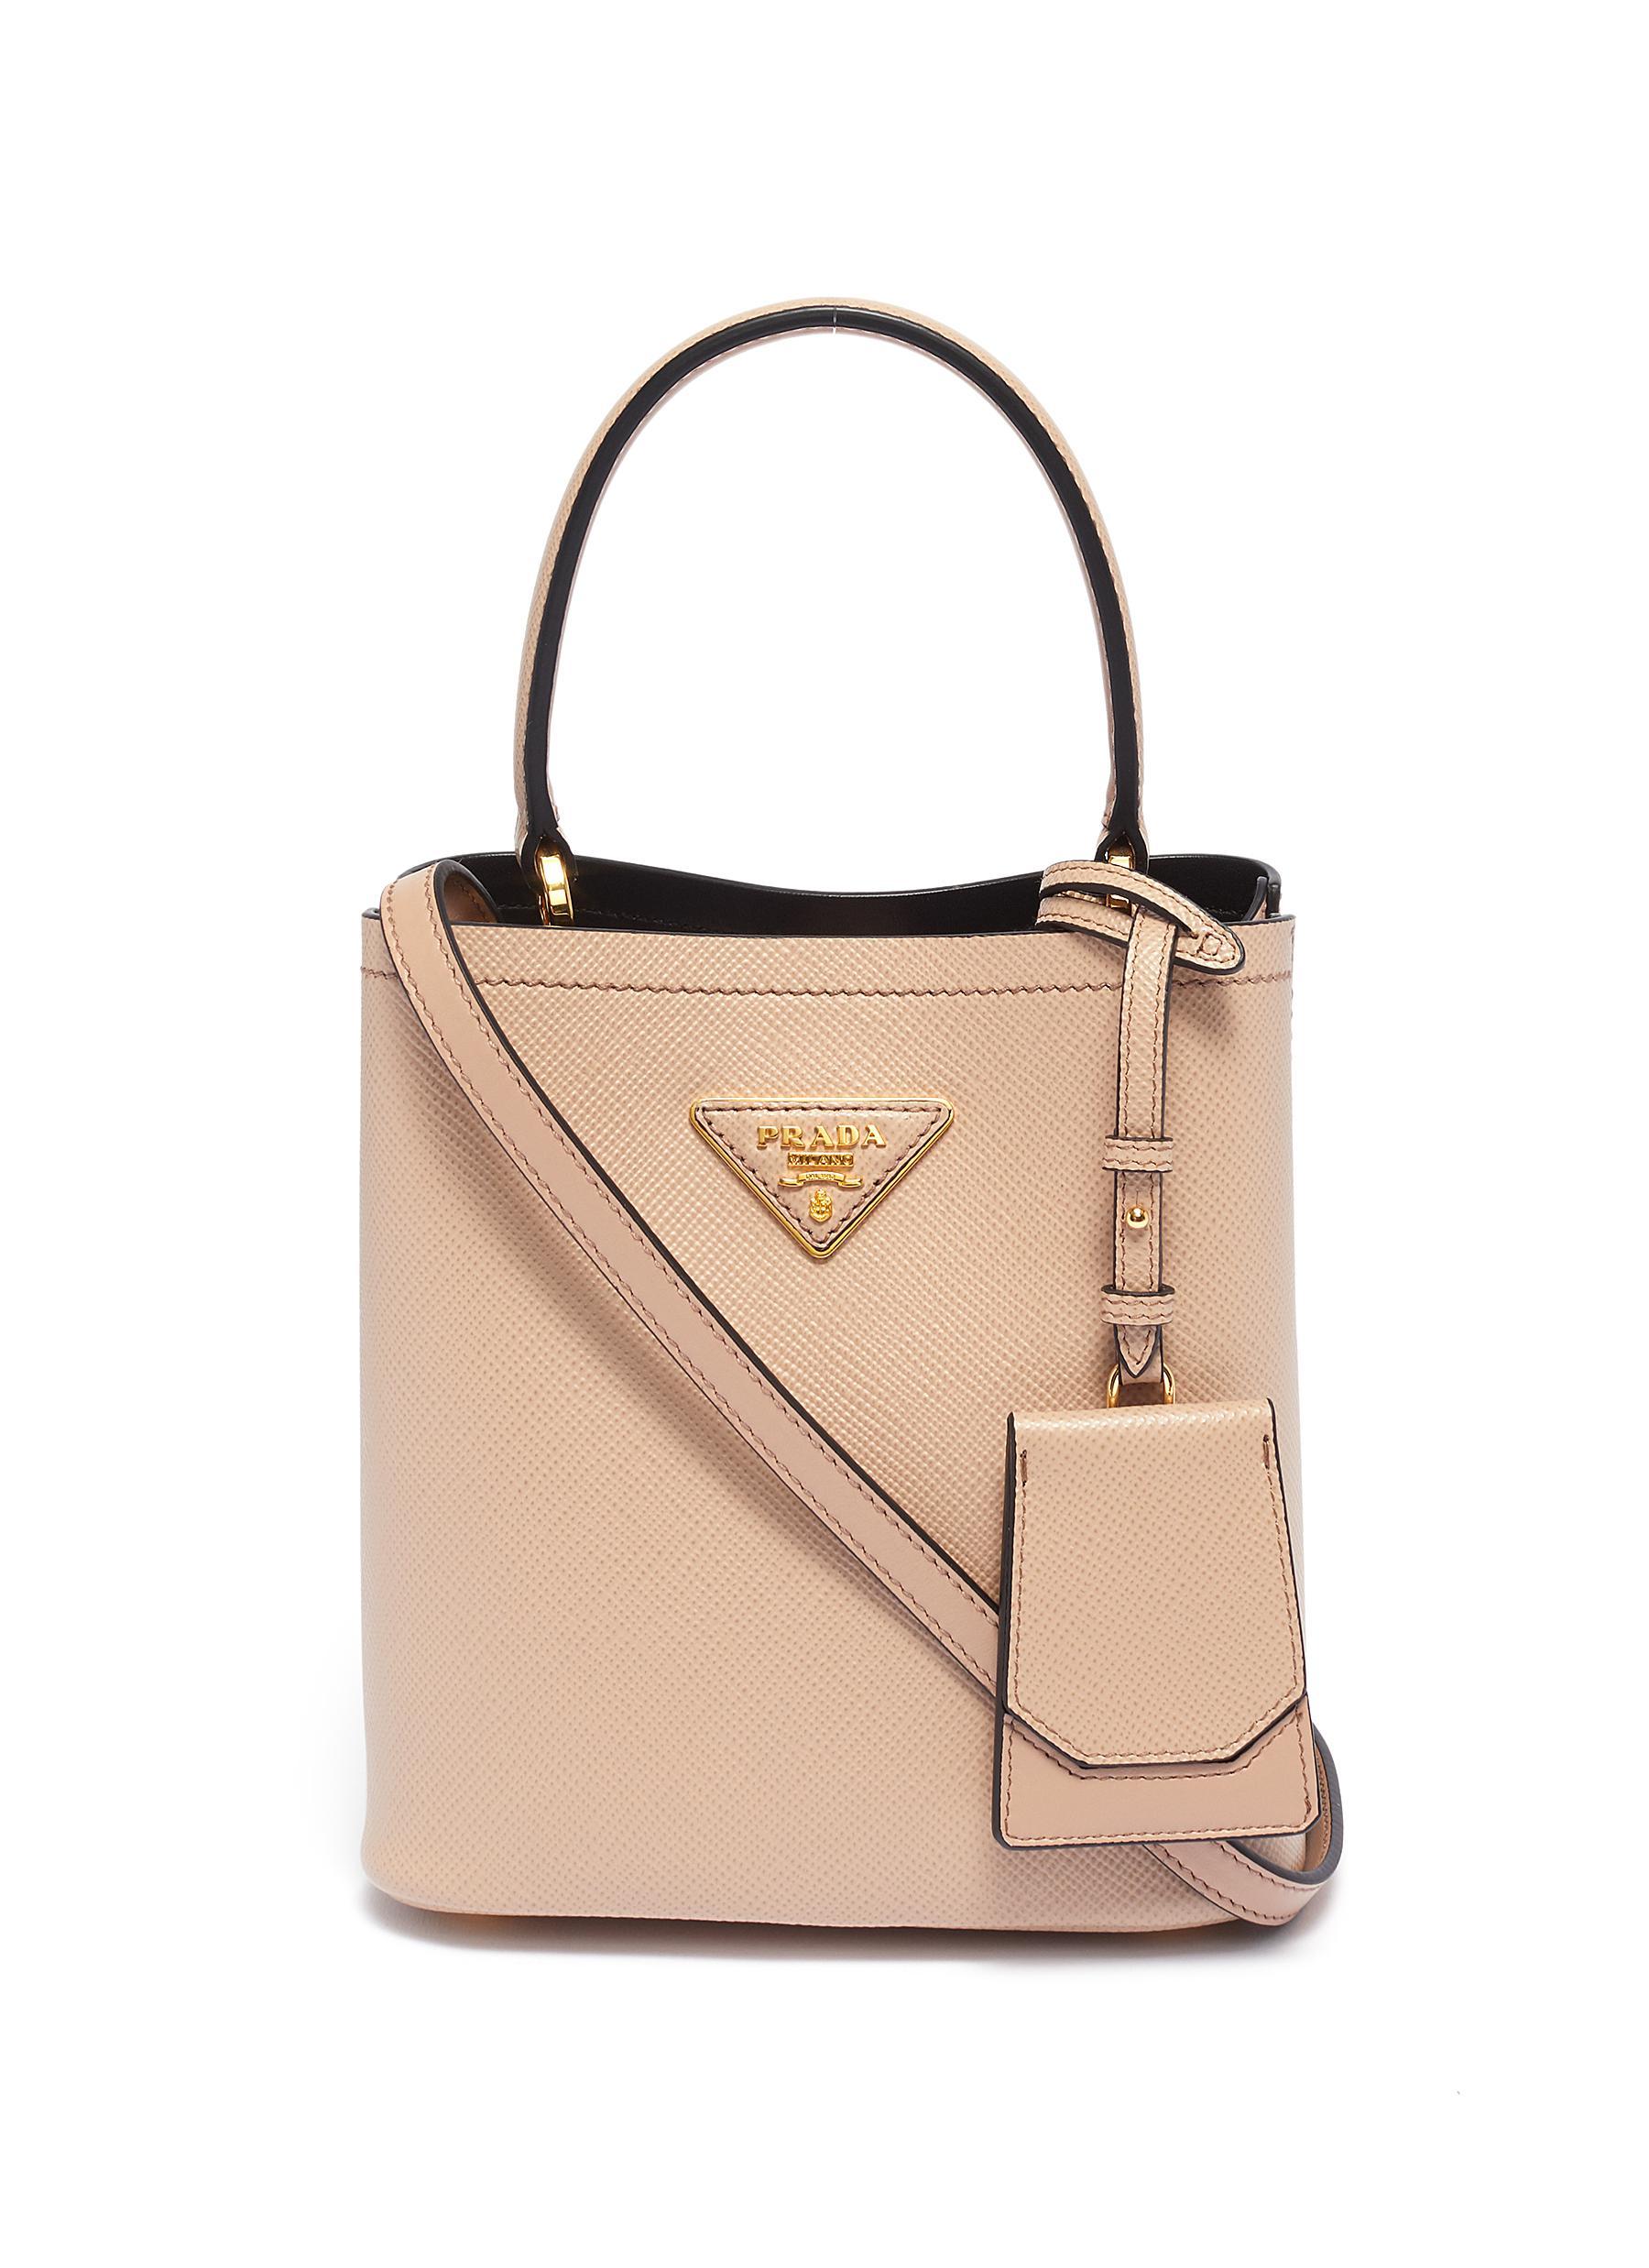 Prada 'Panier' Small Leather Bucket Bag